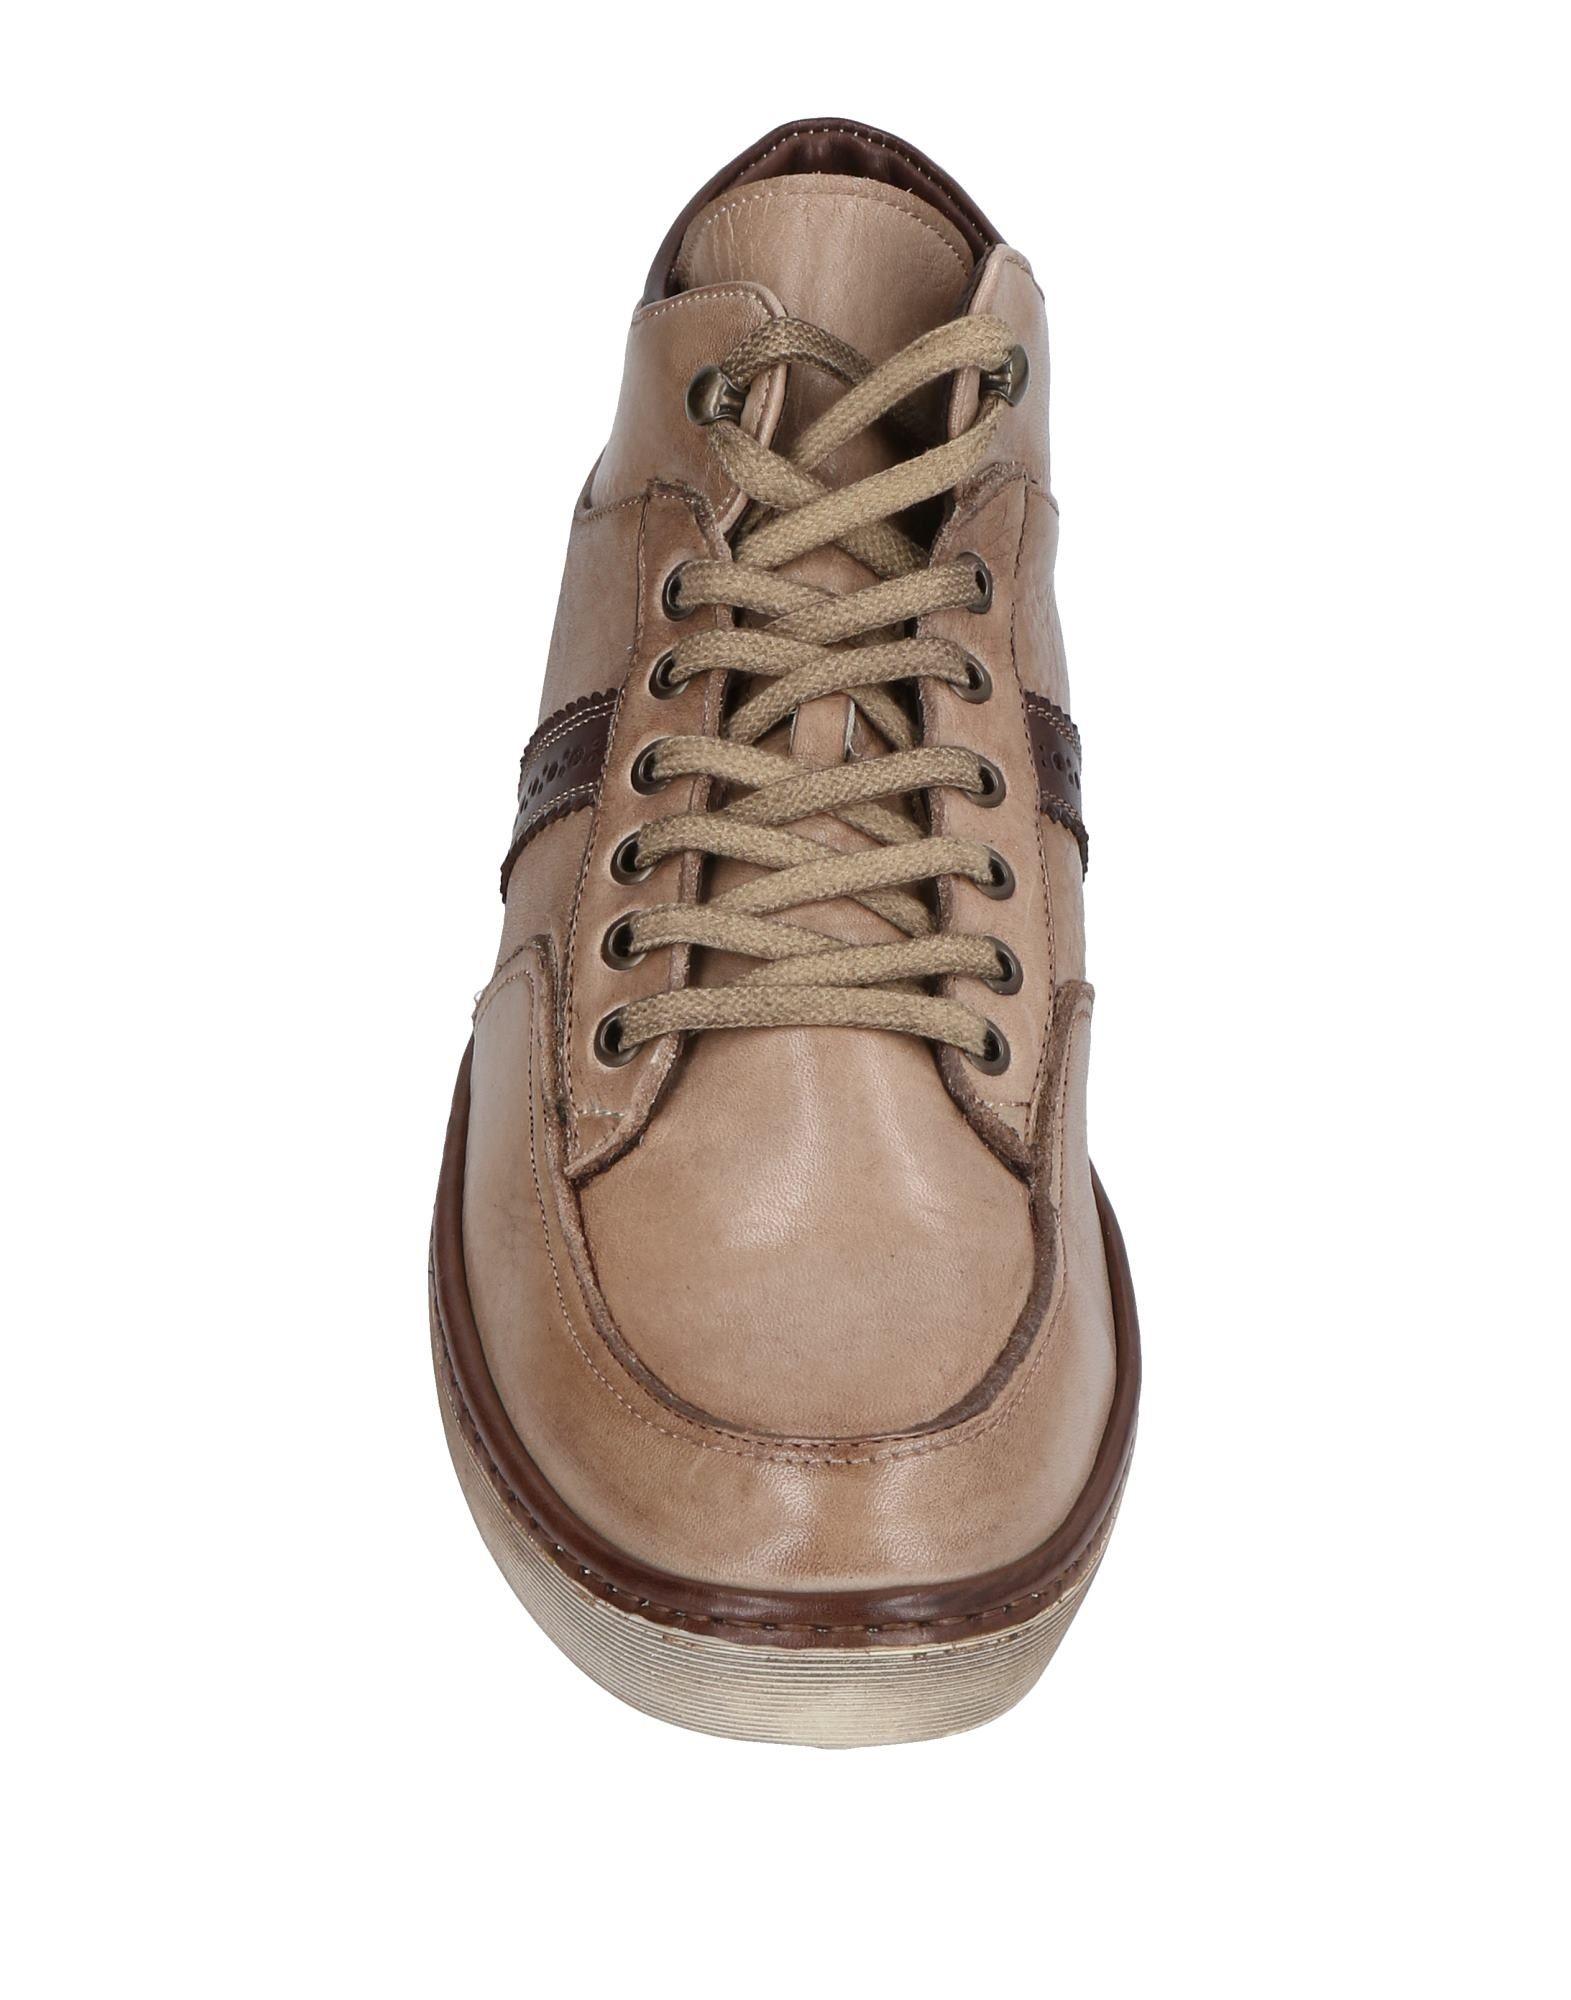 ... Rabatt echte Schuhe Calpierre Sneakers Sneakers Calpierre Herren  11462190BR 0e07b8 ... 9f674a7b14